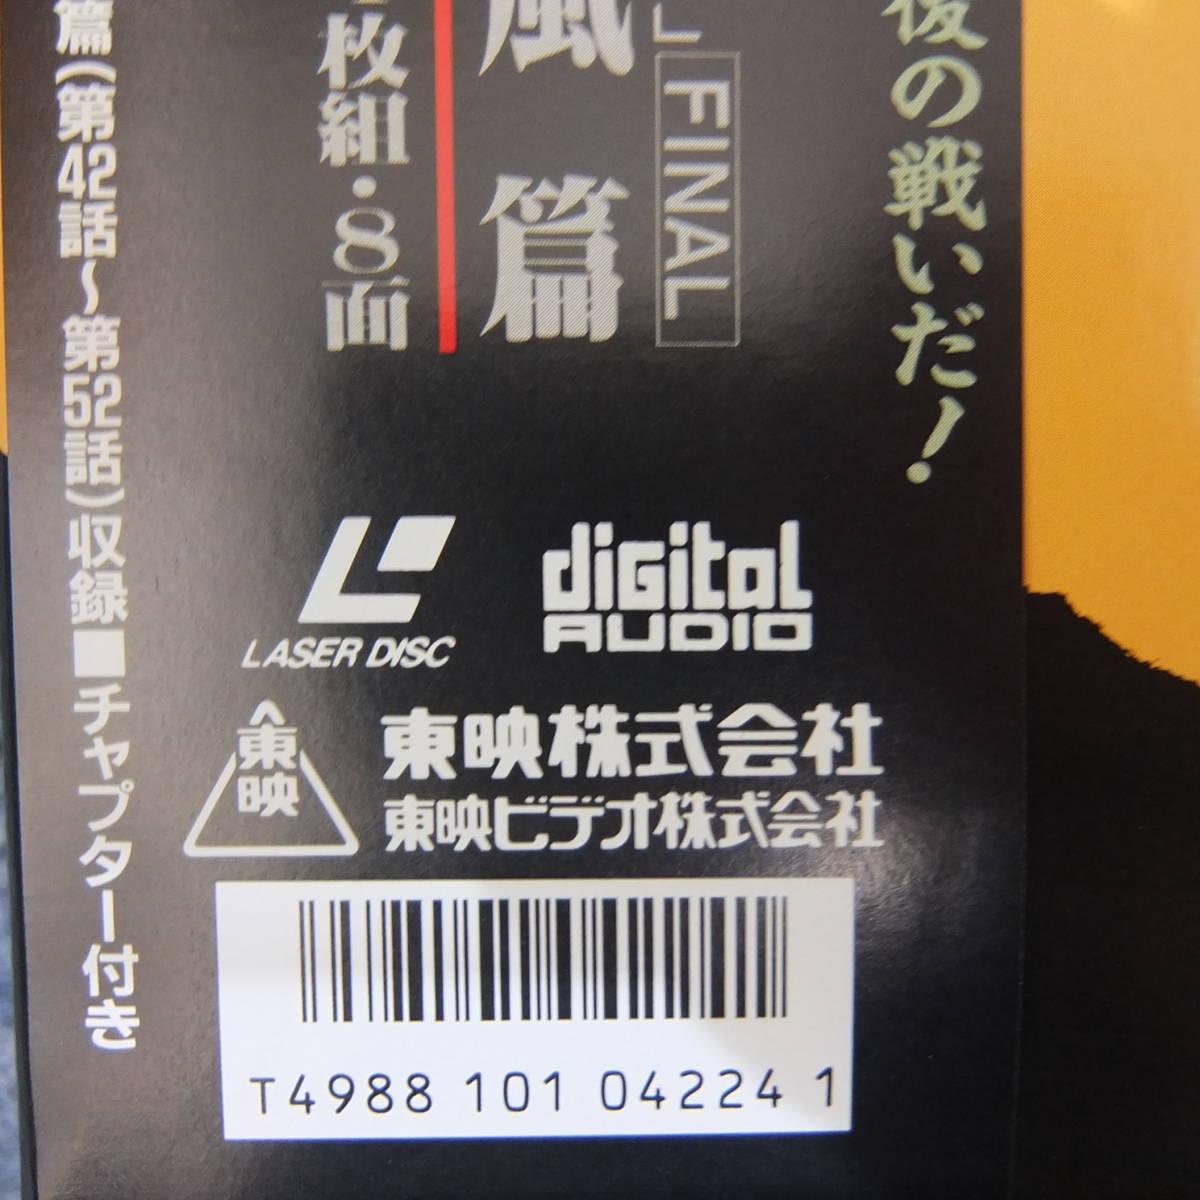 【 LD / レーザーディスク 】 仮面の忍者 赤影 計3本セット 第一部 / 第三部 / 第四部 東映_画像5